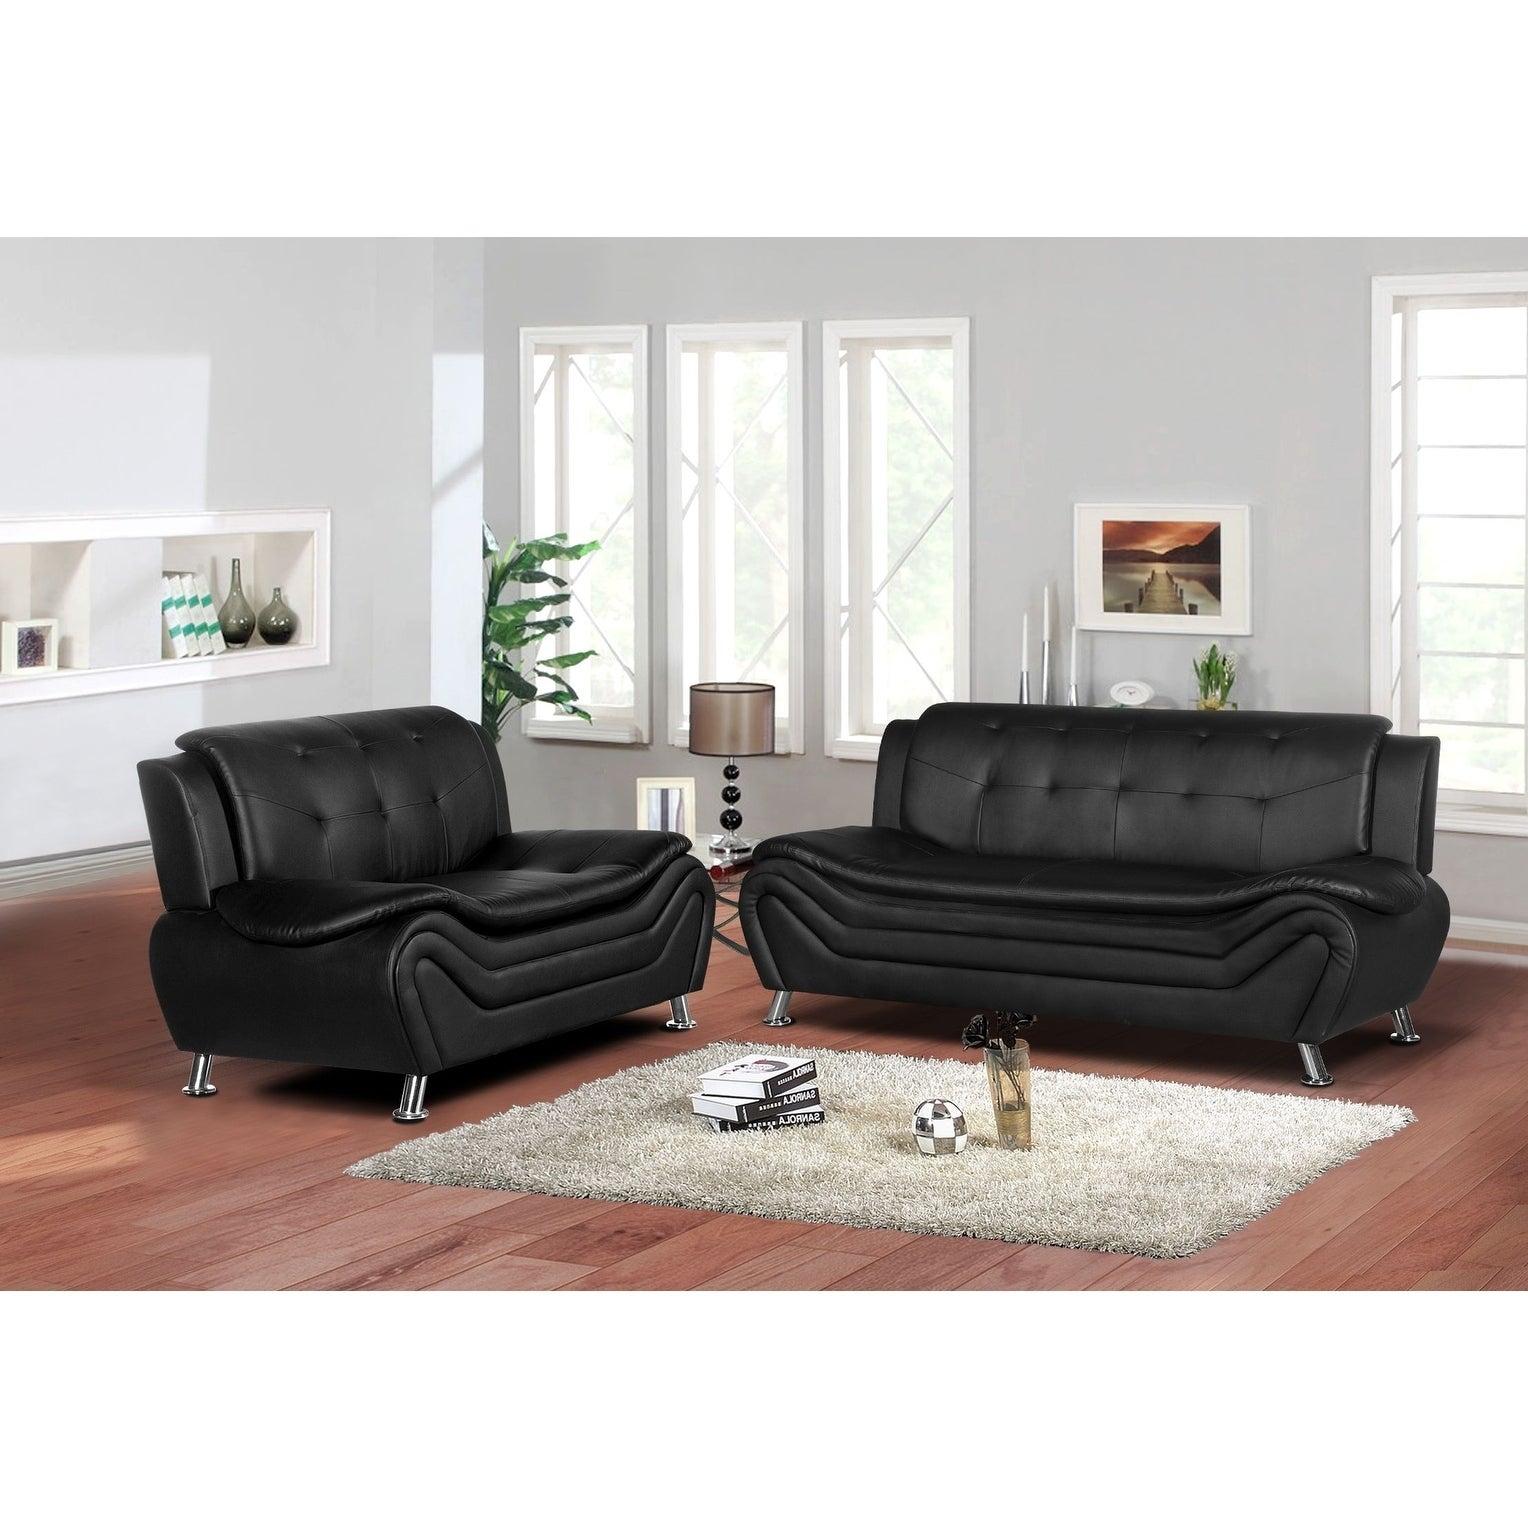 Jasmine Faux leather 2pc Living room Set